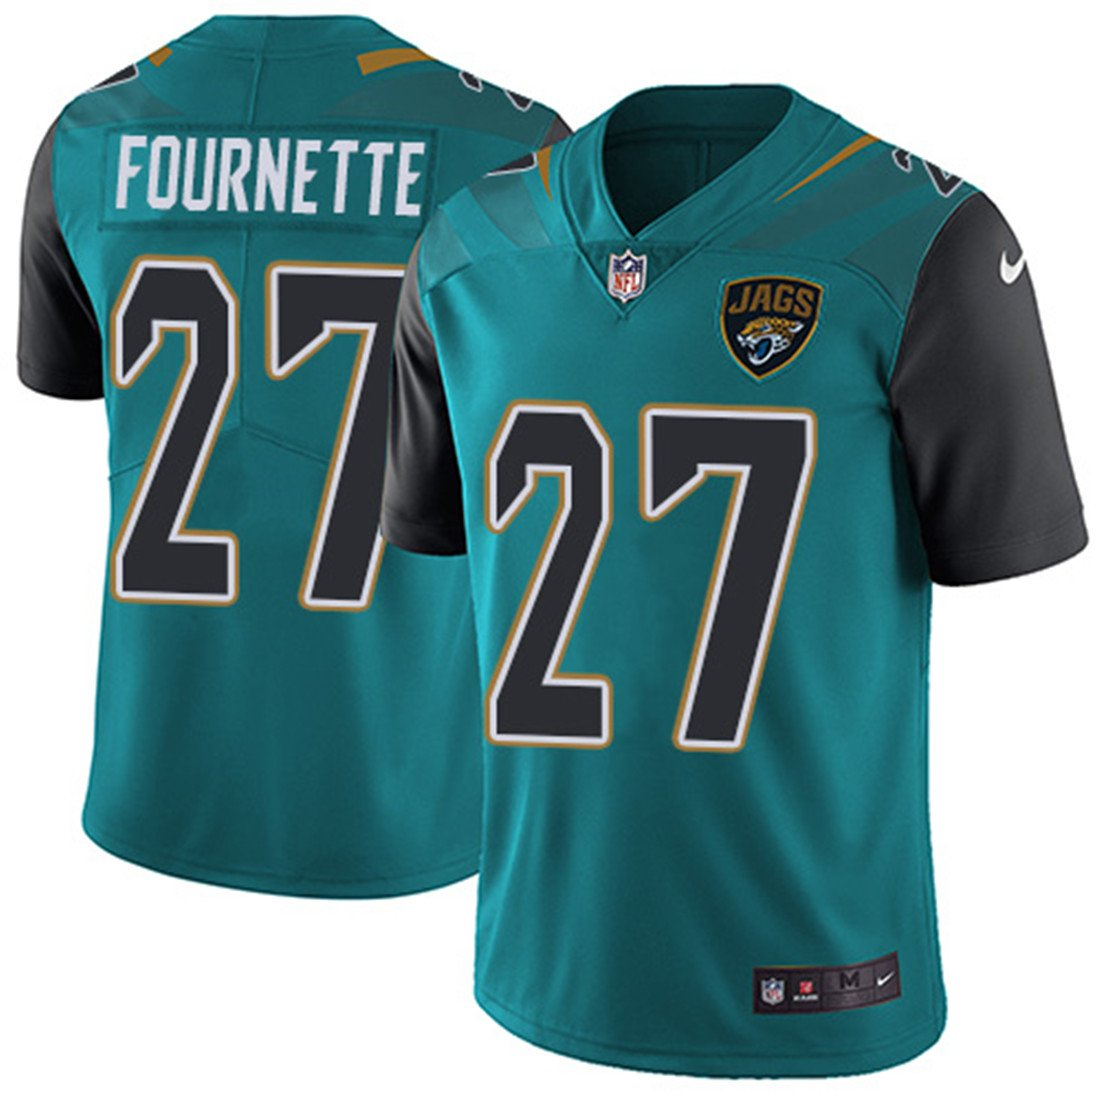 best service 4a2e7 6f1e4 Amazon.com: Nike Leonard Fournette #27 Jacksonville Jaguars ...